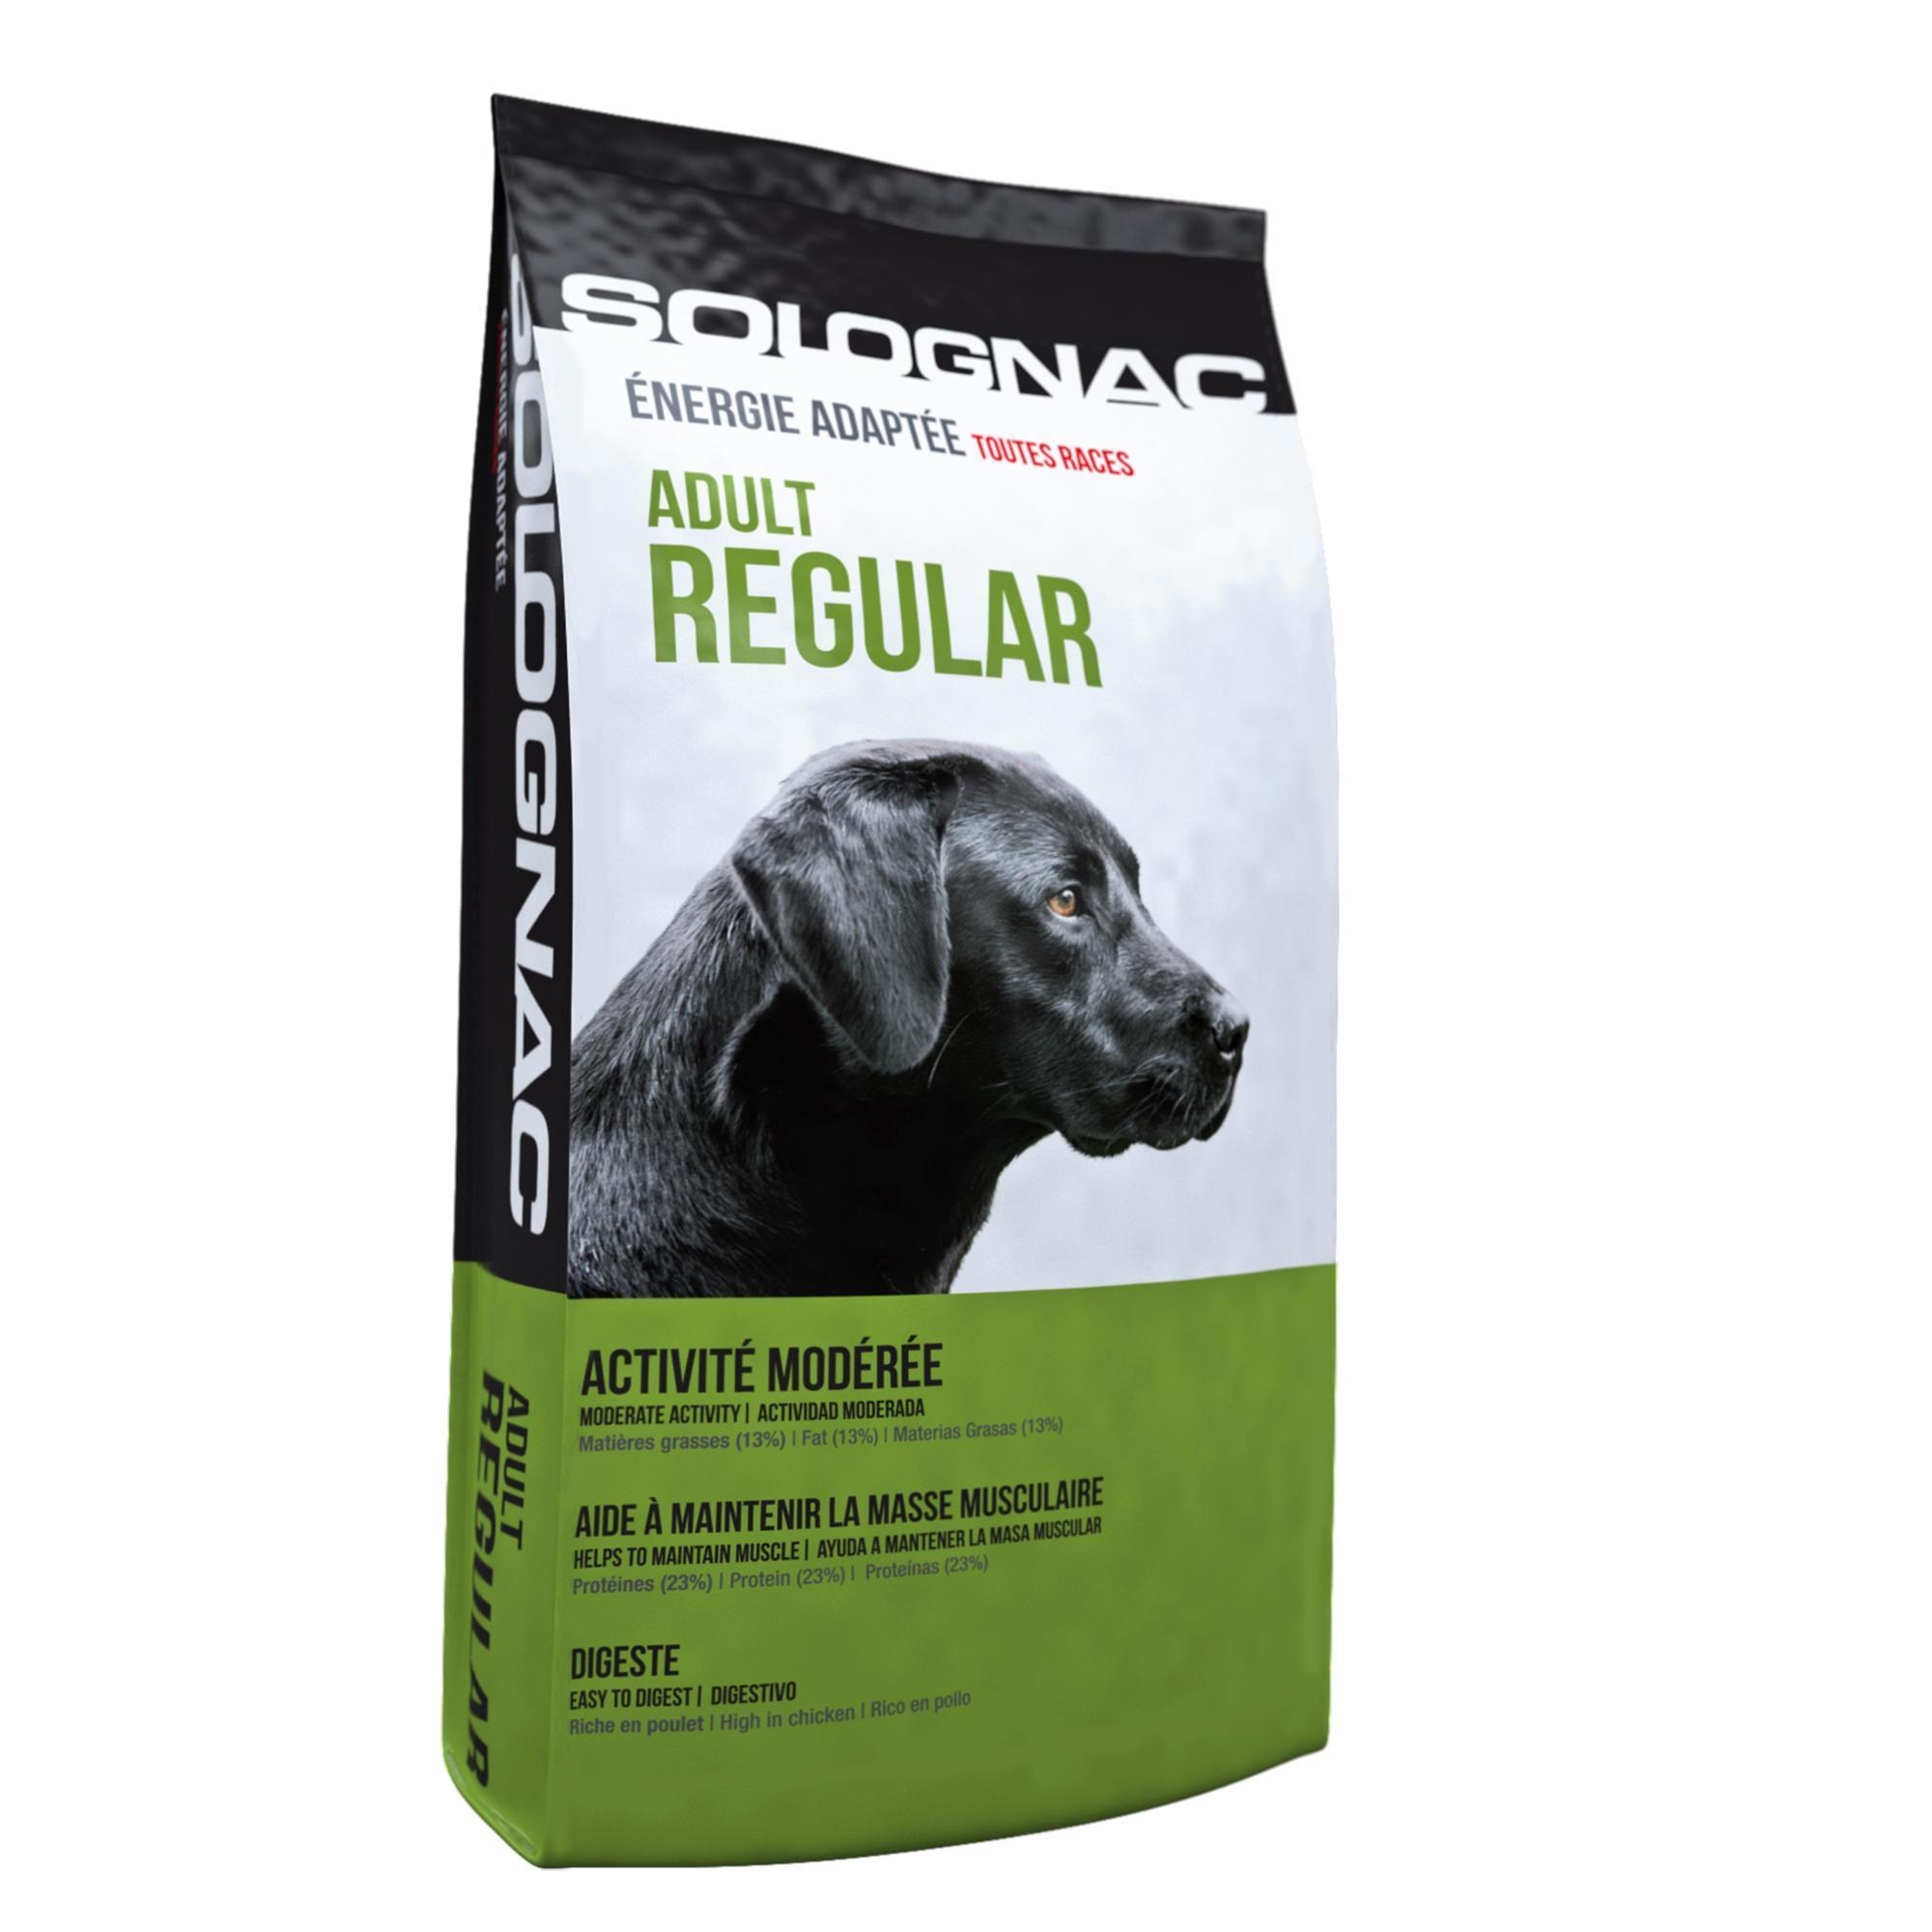 Solognac Hondenvoer Adult Regular 12 kg